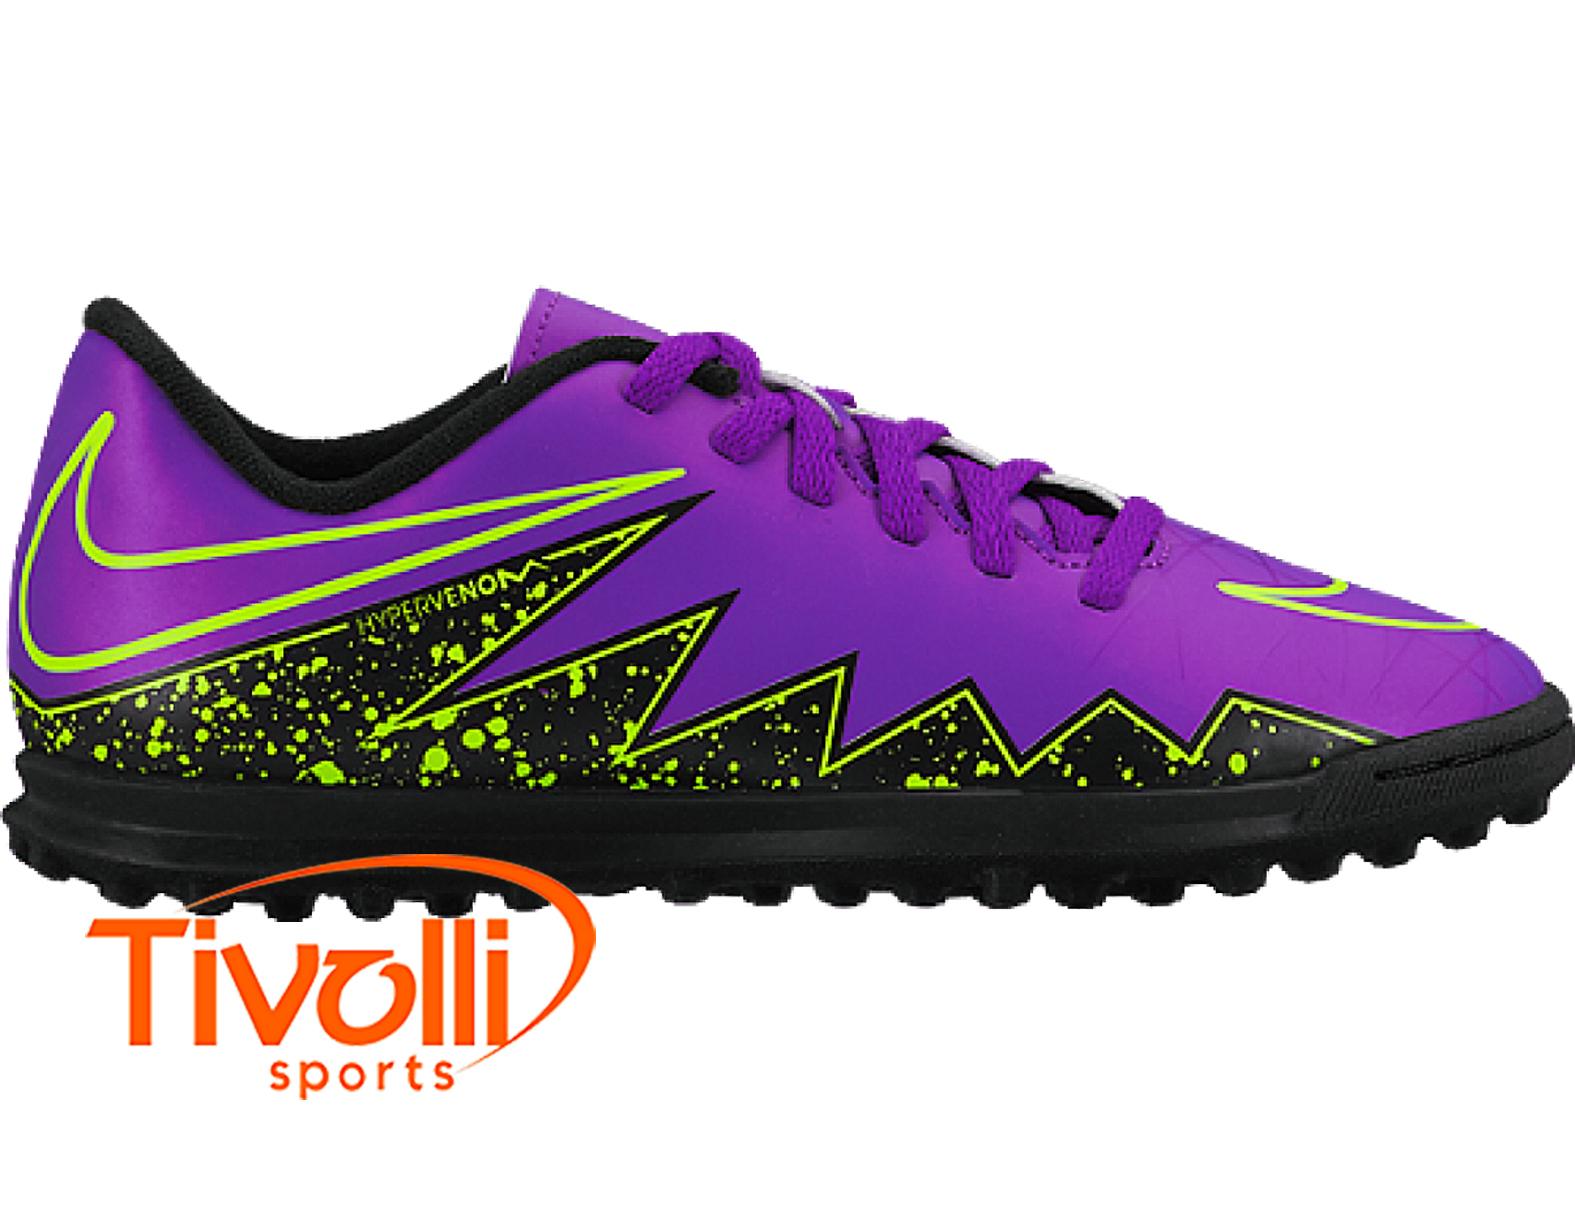 55cd169cc6882 Chuteira Nike JR Hypervenom Phade II TF Society Infantil